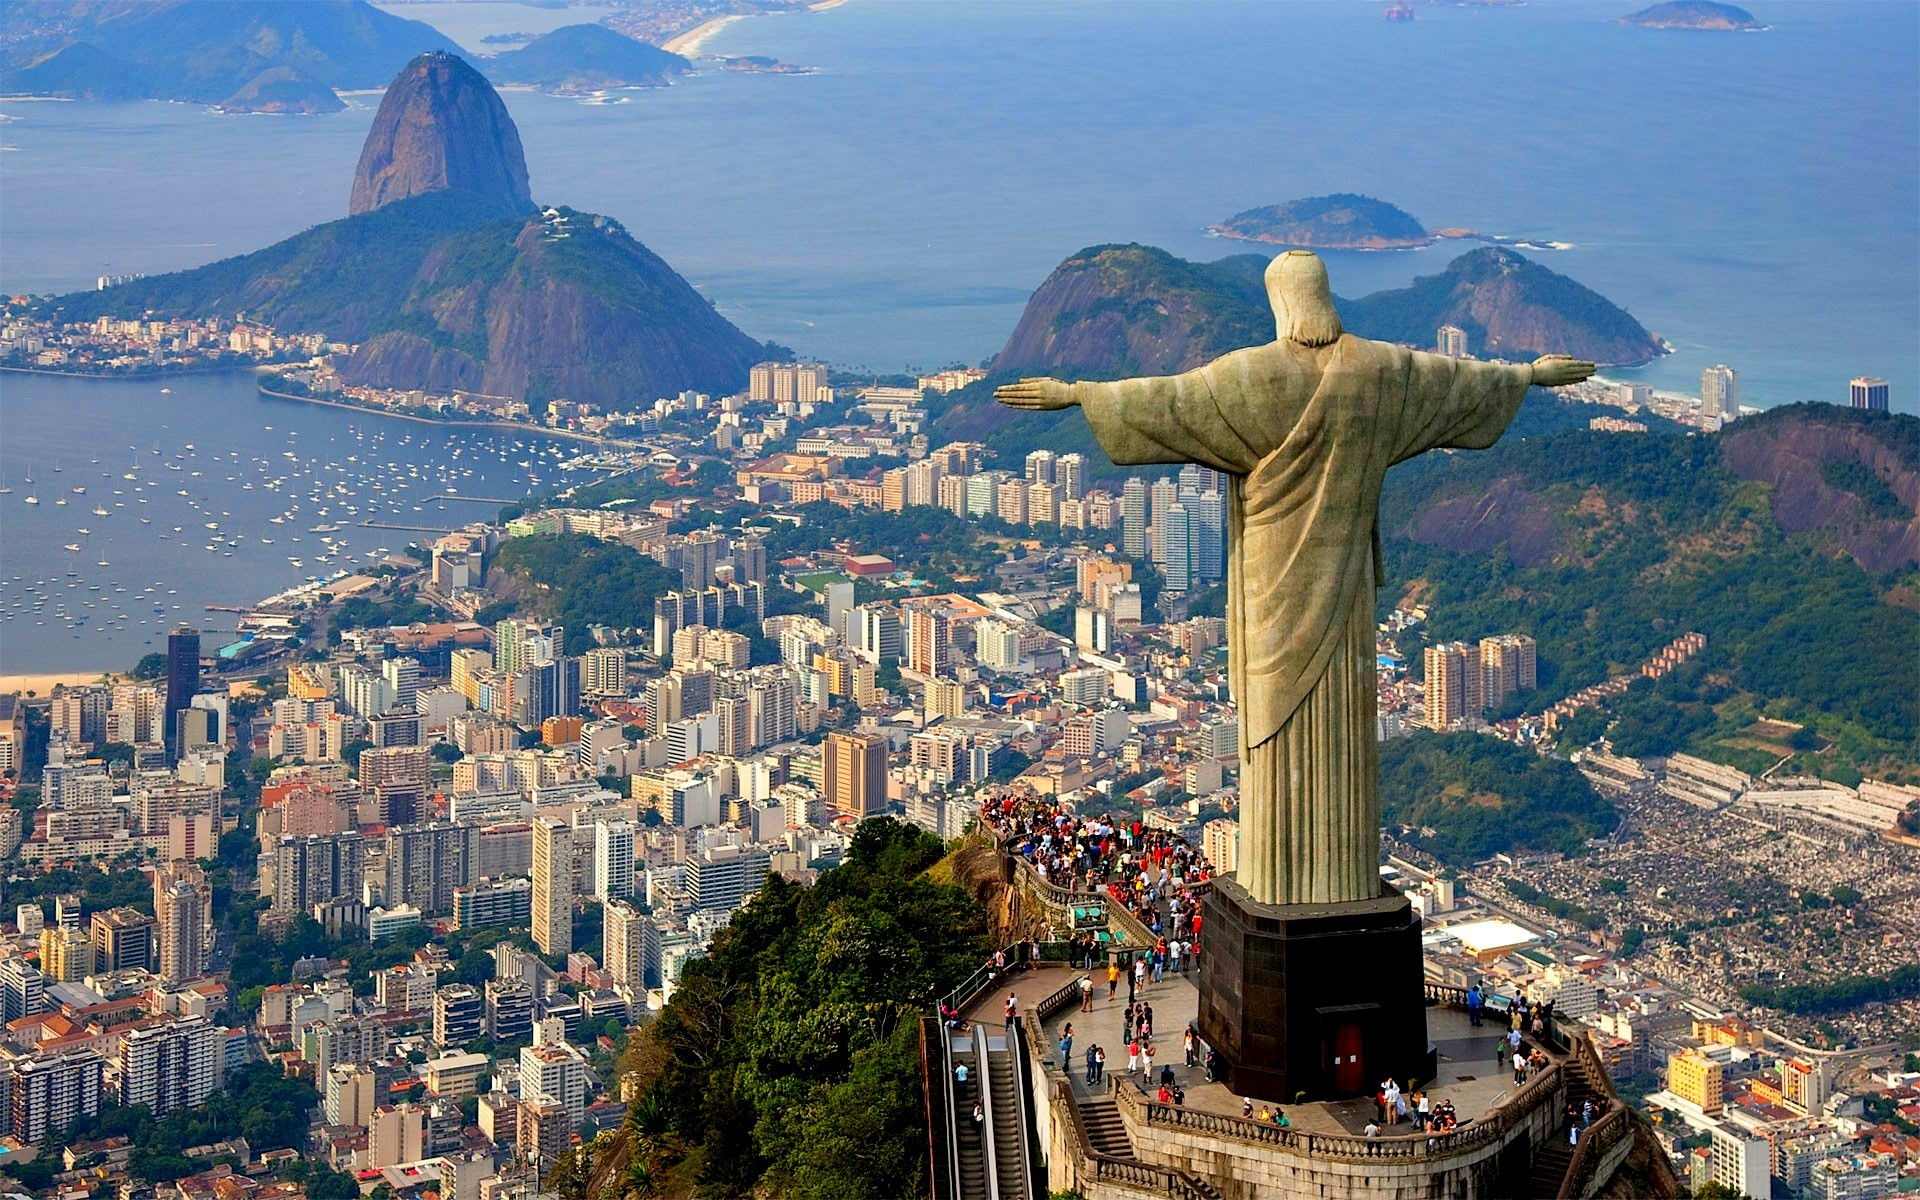 Christ the Redeemer – Statue of Jesus Christ in Rio De Janeiro, Brazil